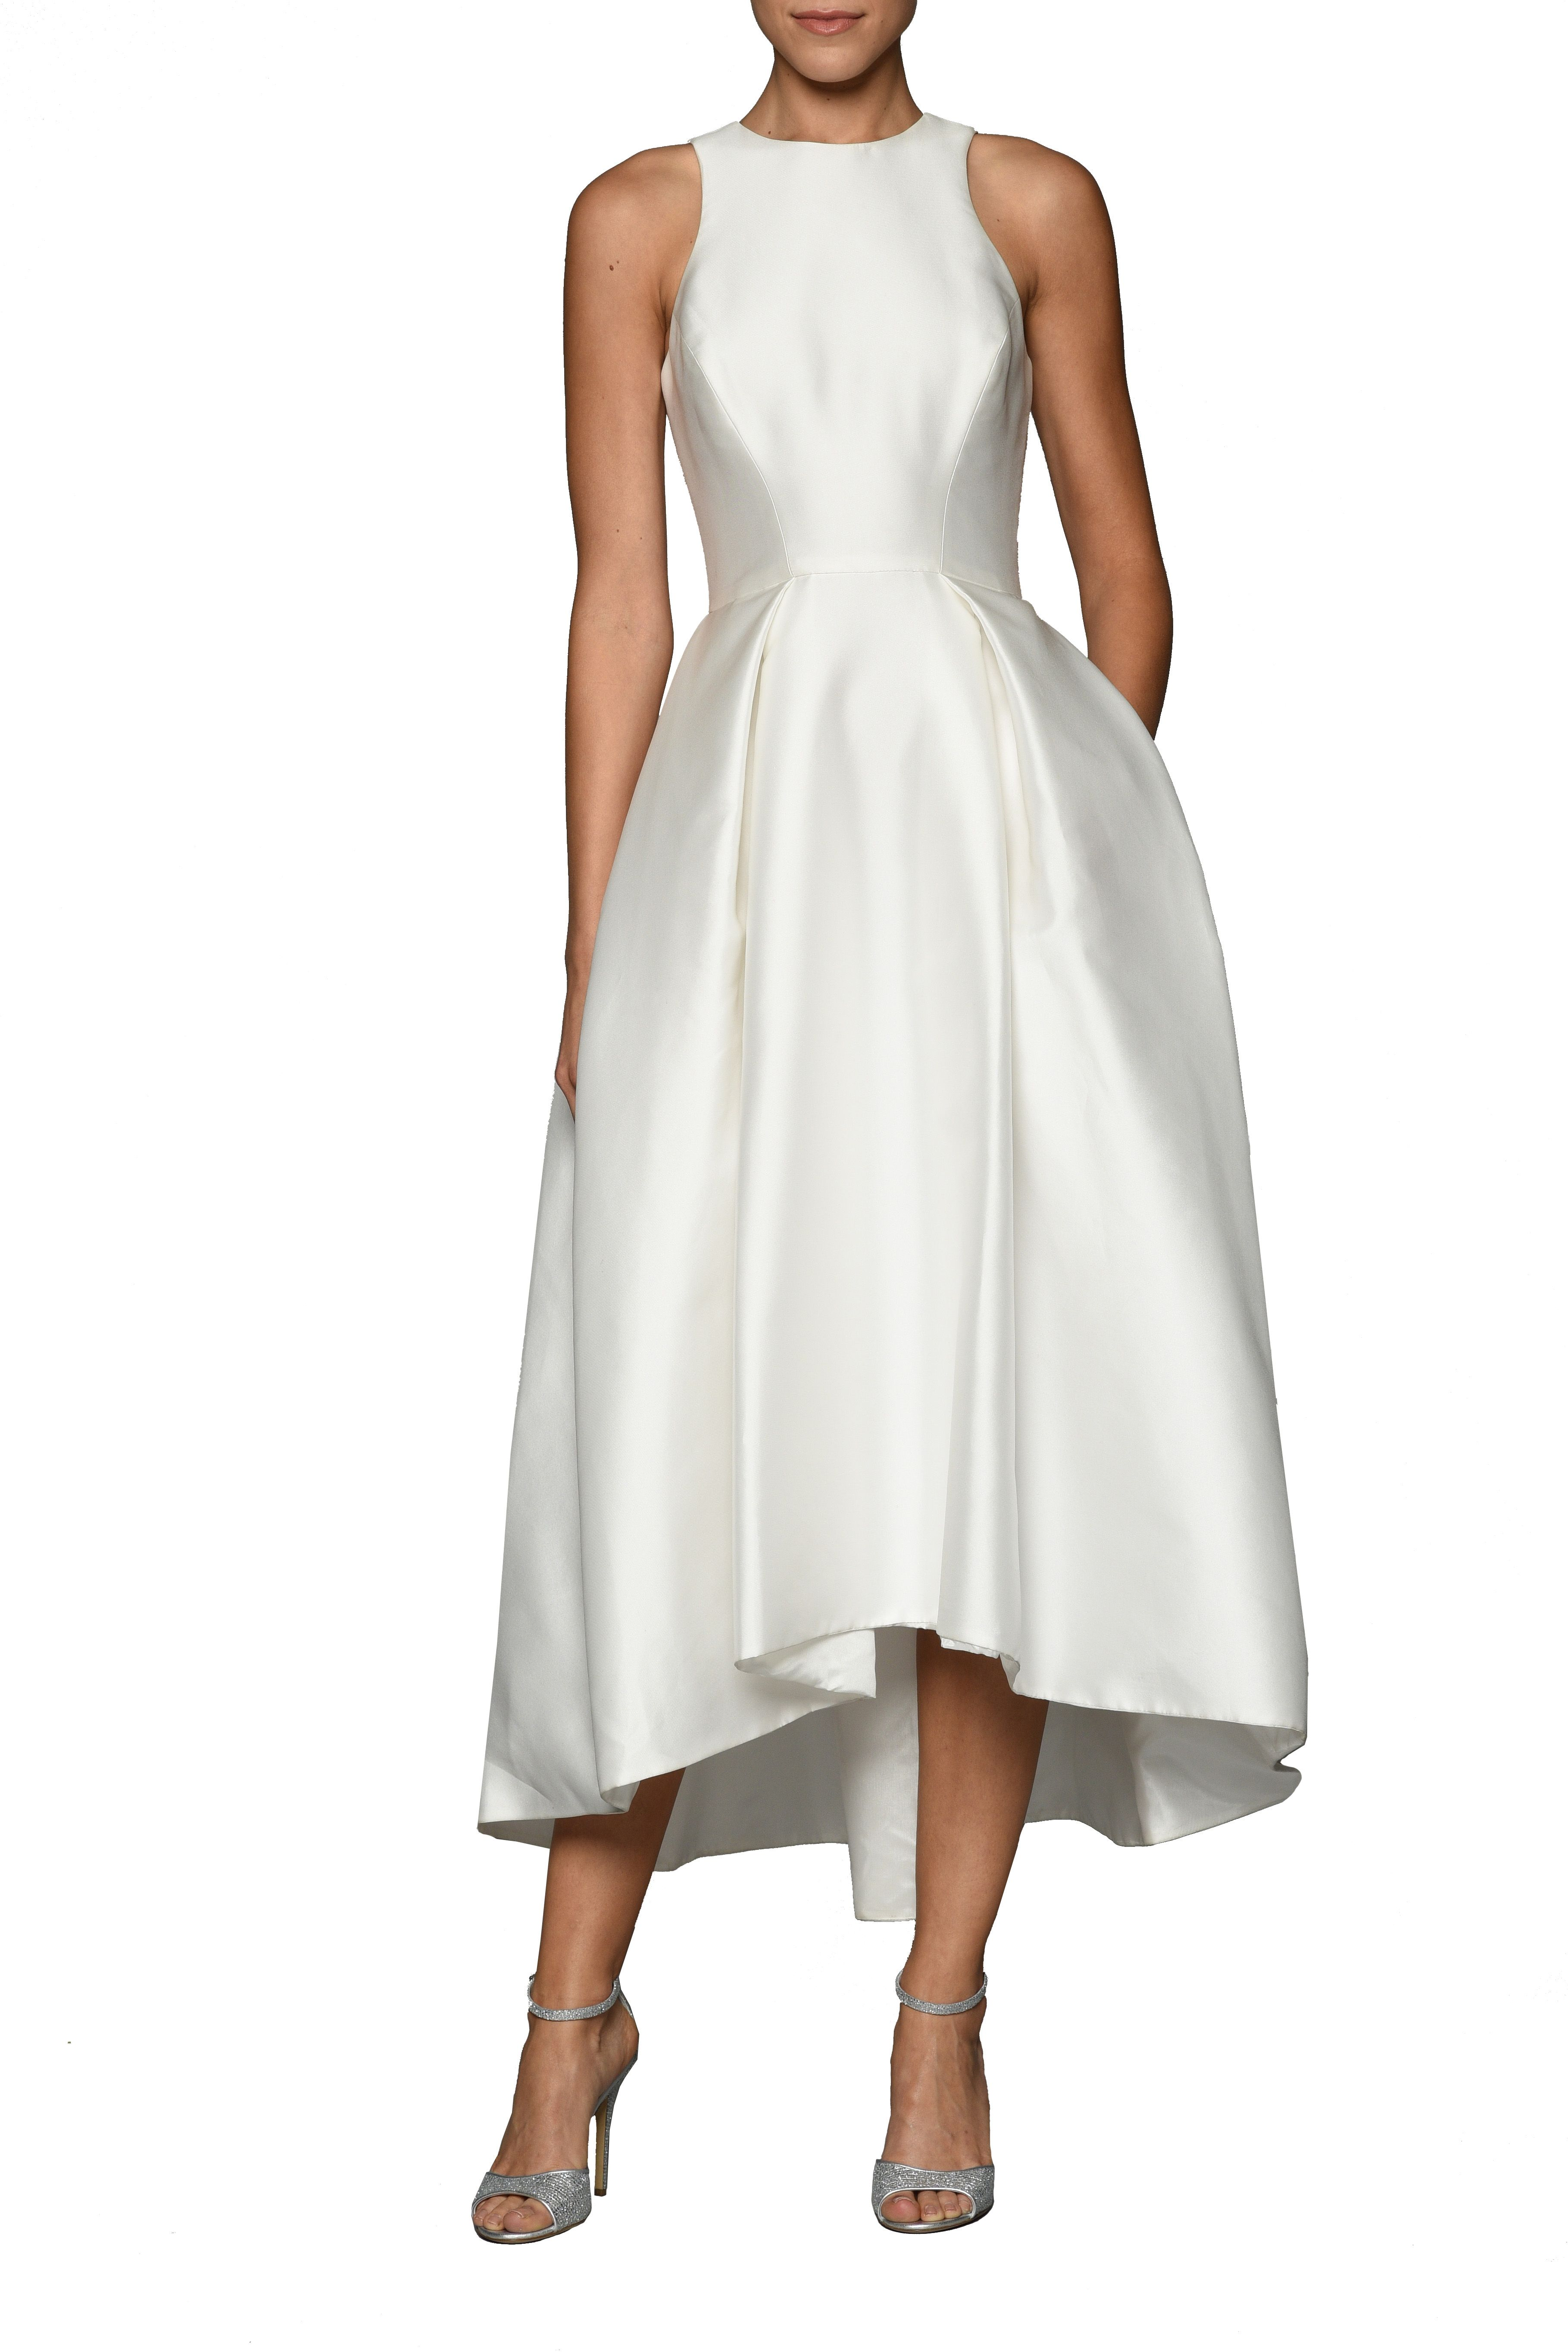 Zelda Main Formal Wedding Dressesbridesmaid Dressesrehearsal Dinner Dressestea Length Dressesmonique Lhuillierzeldaelopementswedding